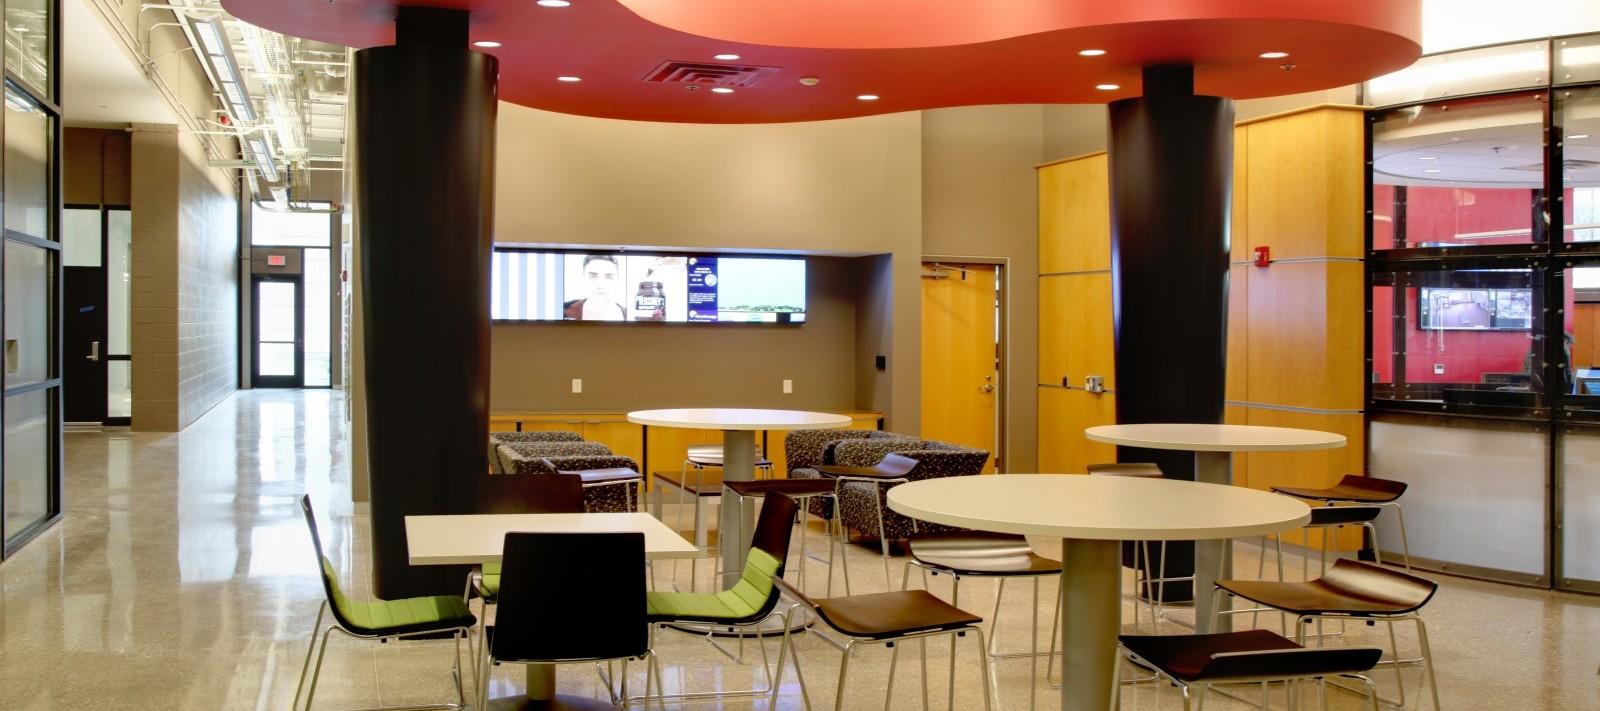 MetroLINK Transit maintenance facility lunch room